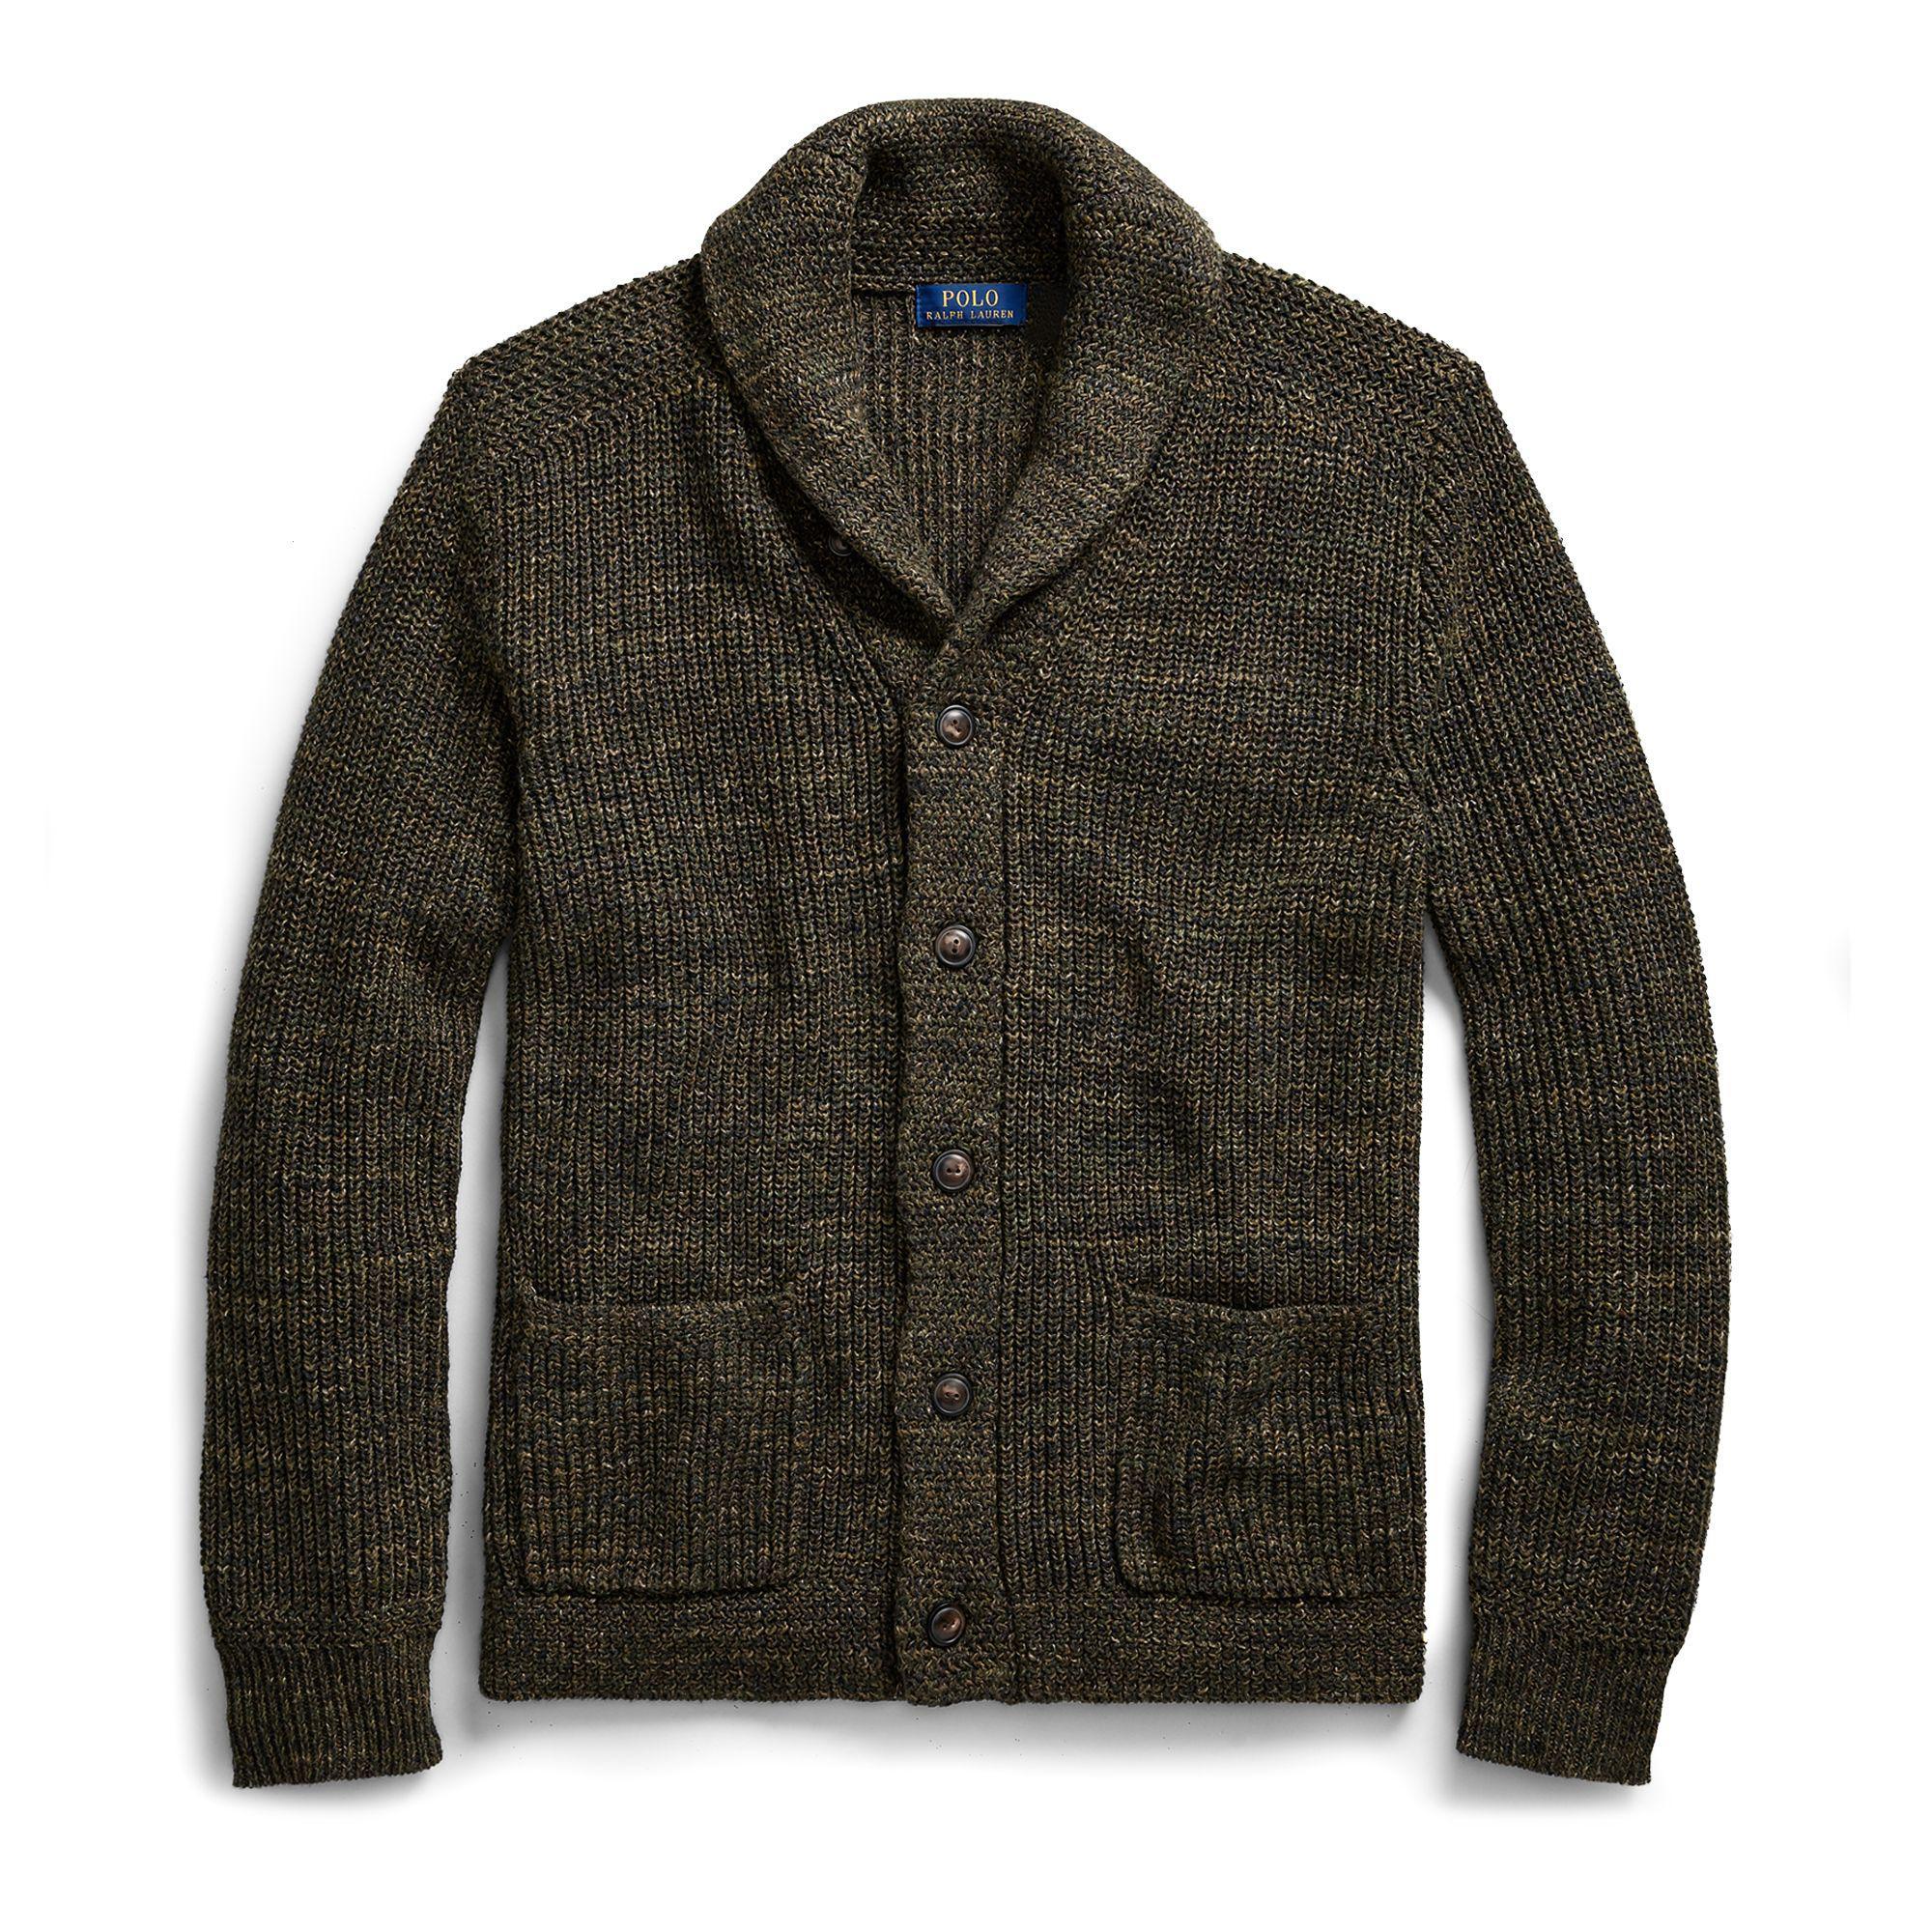 8214a4e43 Polo Ralph Lauren Cotton Shawl-collar Cardigan in Green for Men - Lyst